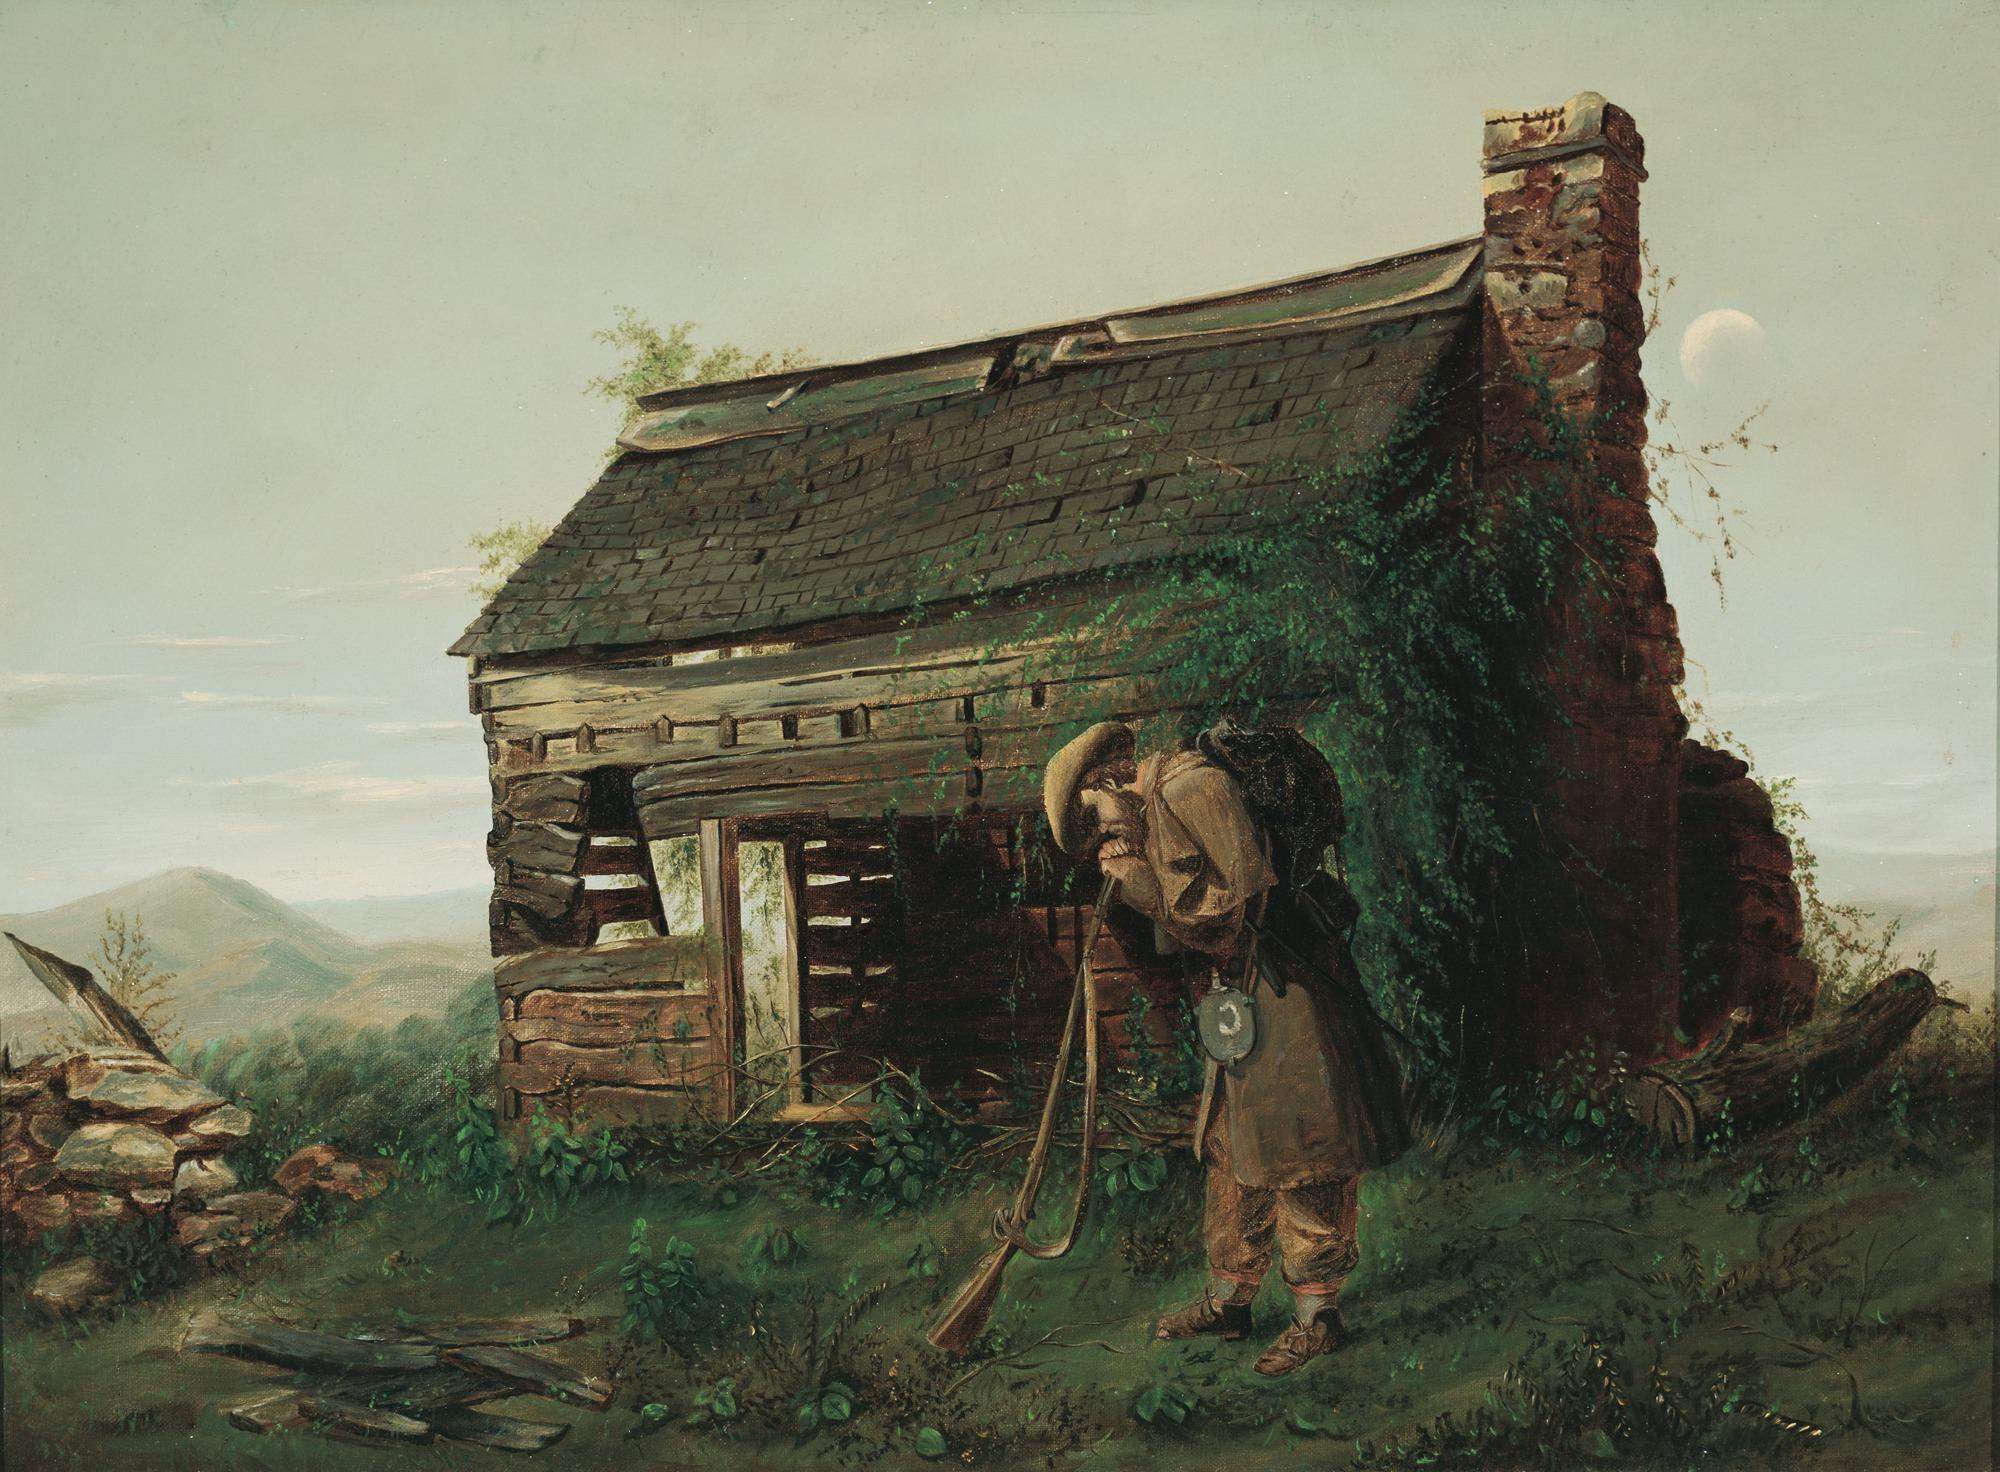 mosler_lostcause-MORRIS-MUSEUM-OF-ART1869